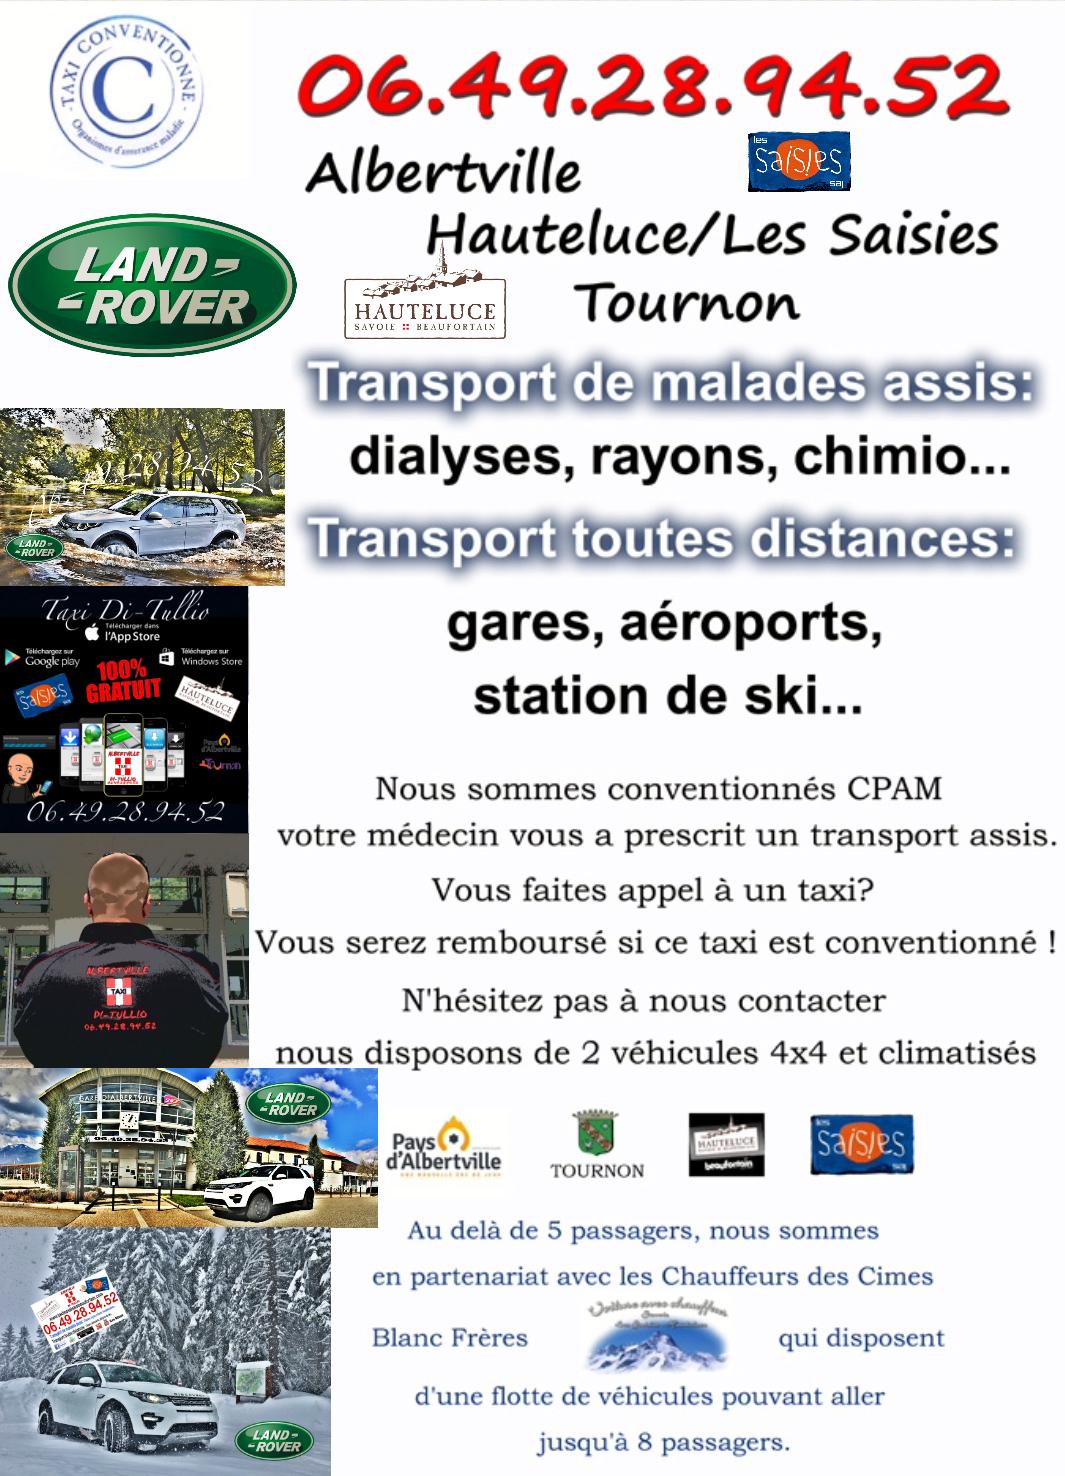 Taxi Albertville, Taxi Les Saisies, Taxi Hauteluce.